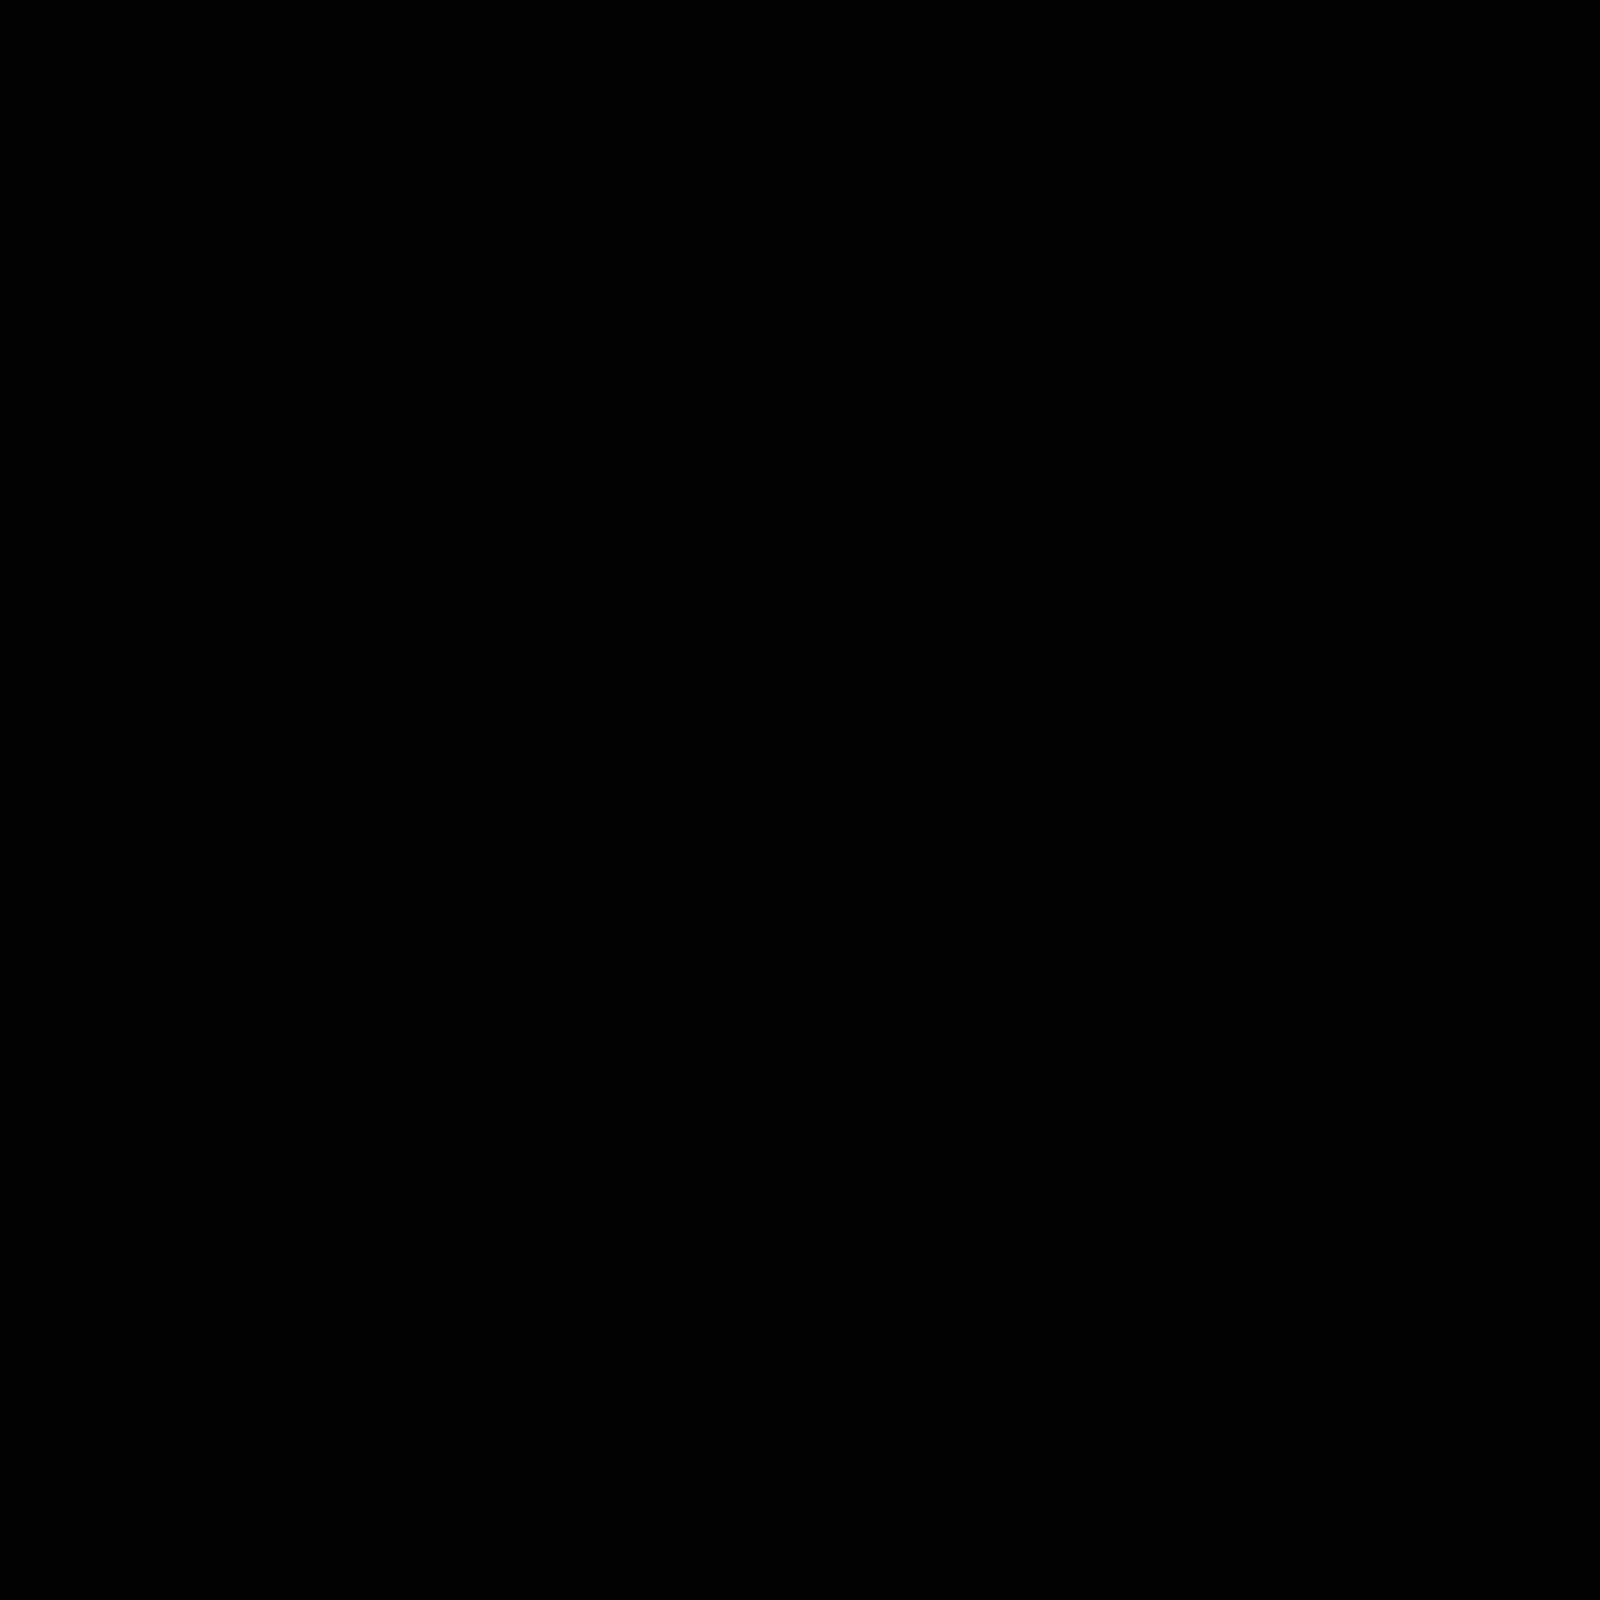 jpg transparent download Download Icon